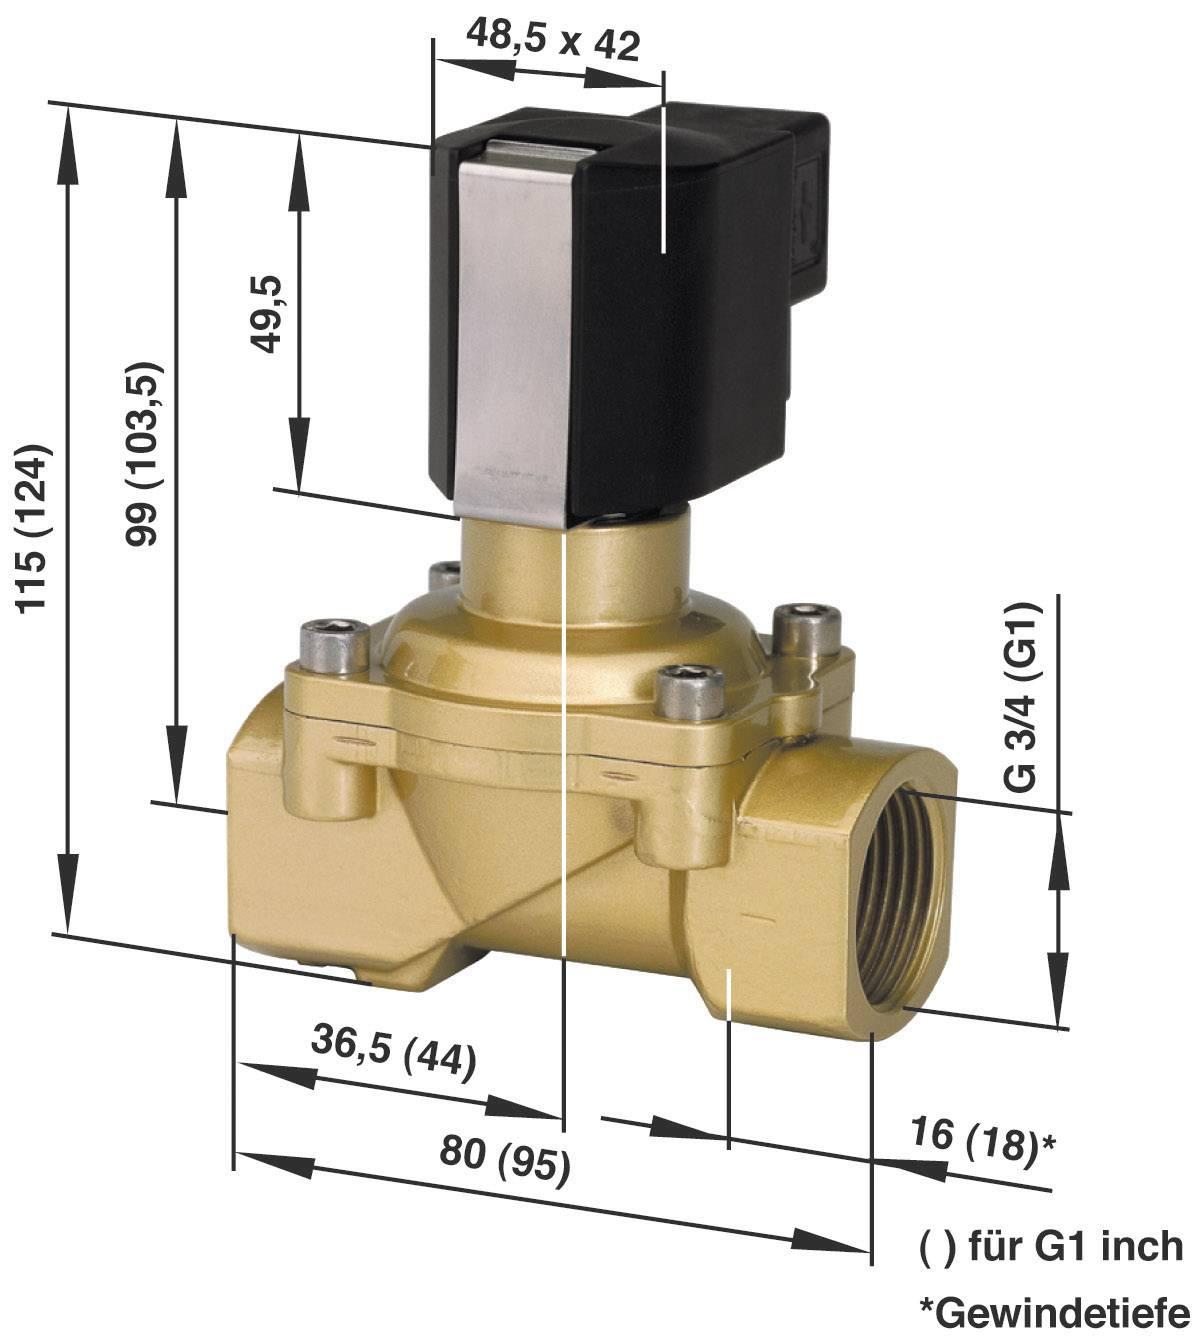 2/2-cestný mechanicky odolný ventil pneumatiky Busch Jost 8254300.9151.02400, G 3/4, 24 V/DC